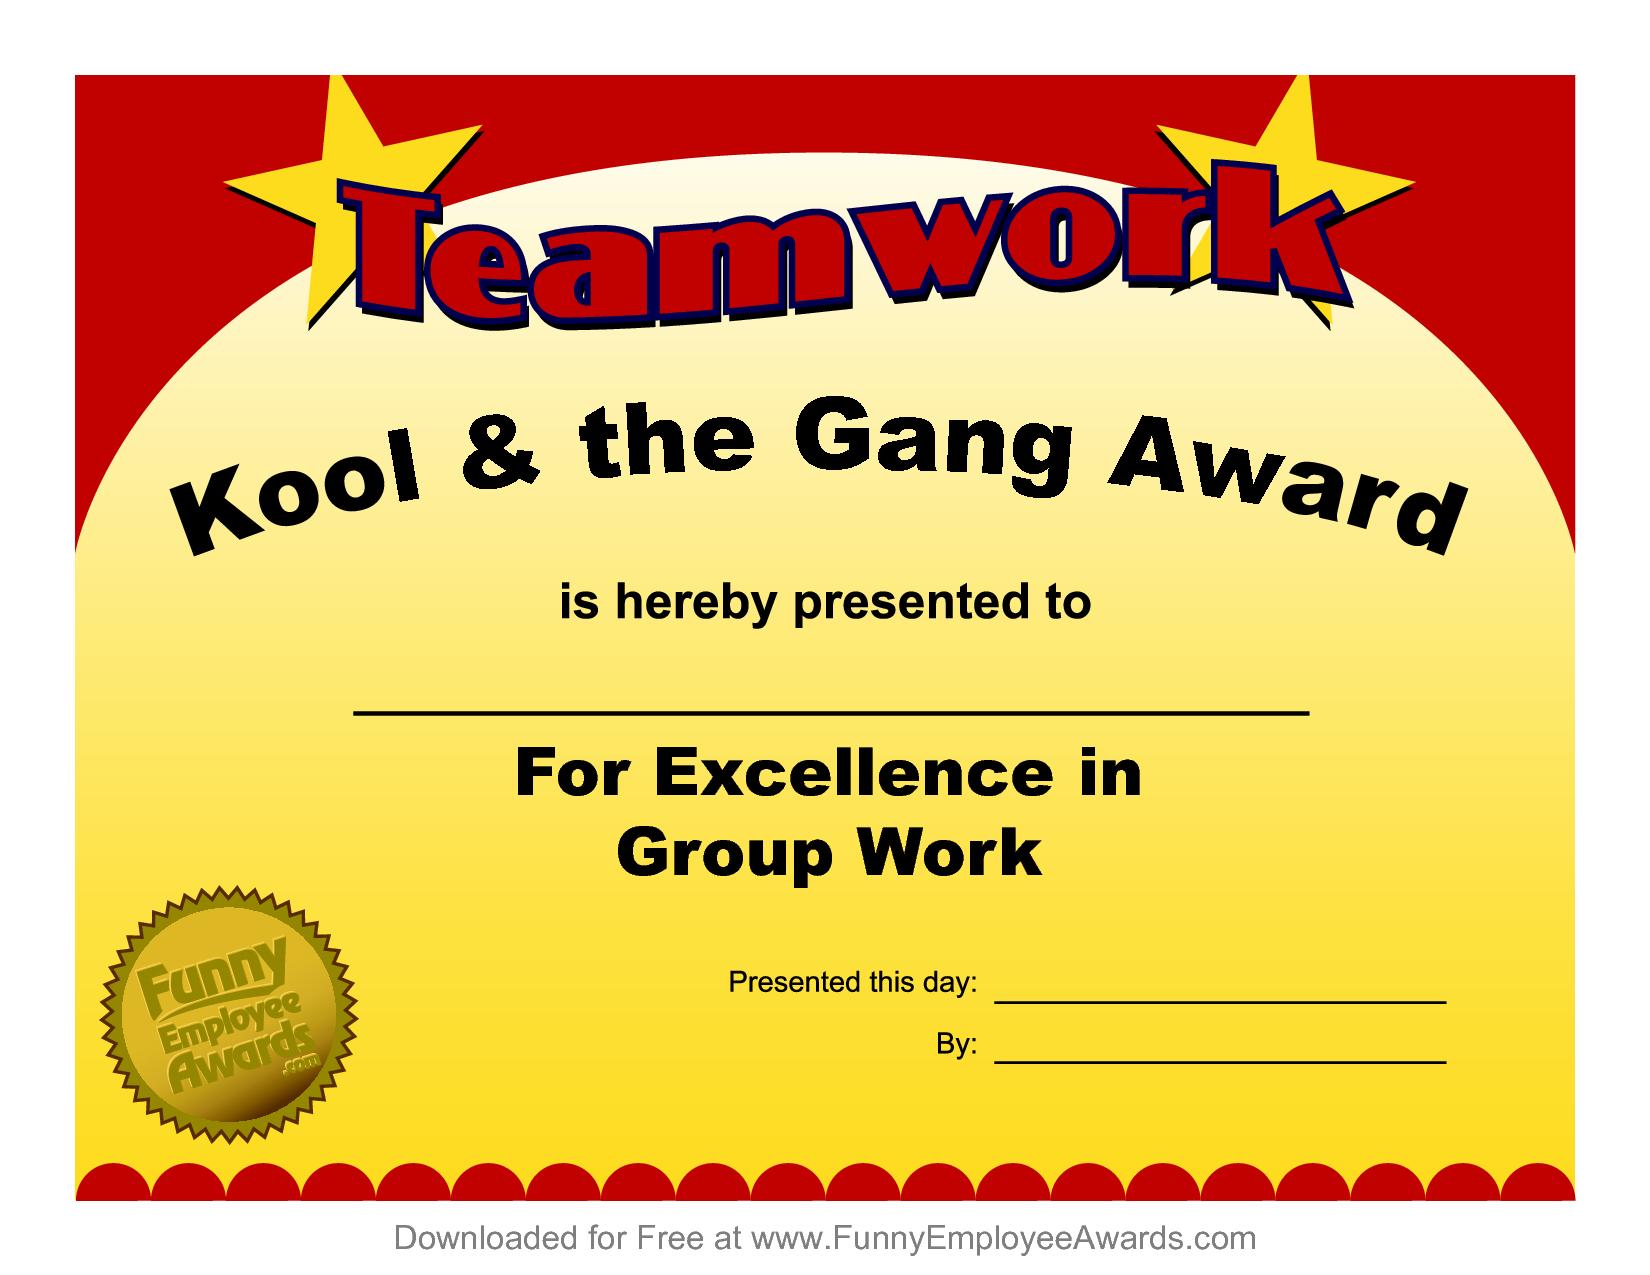 Fun Award Templatefree Employee Award Certificate Templates Pdf - Free Printable Funny Office Awards